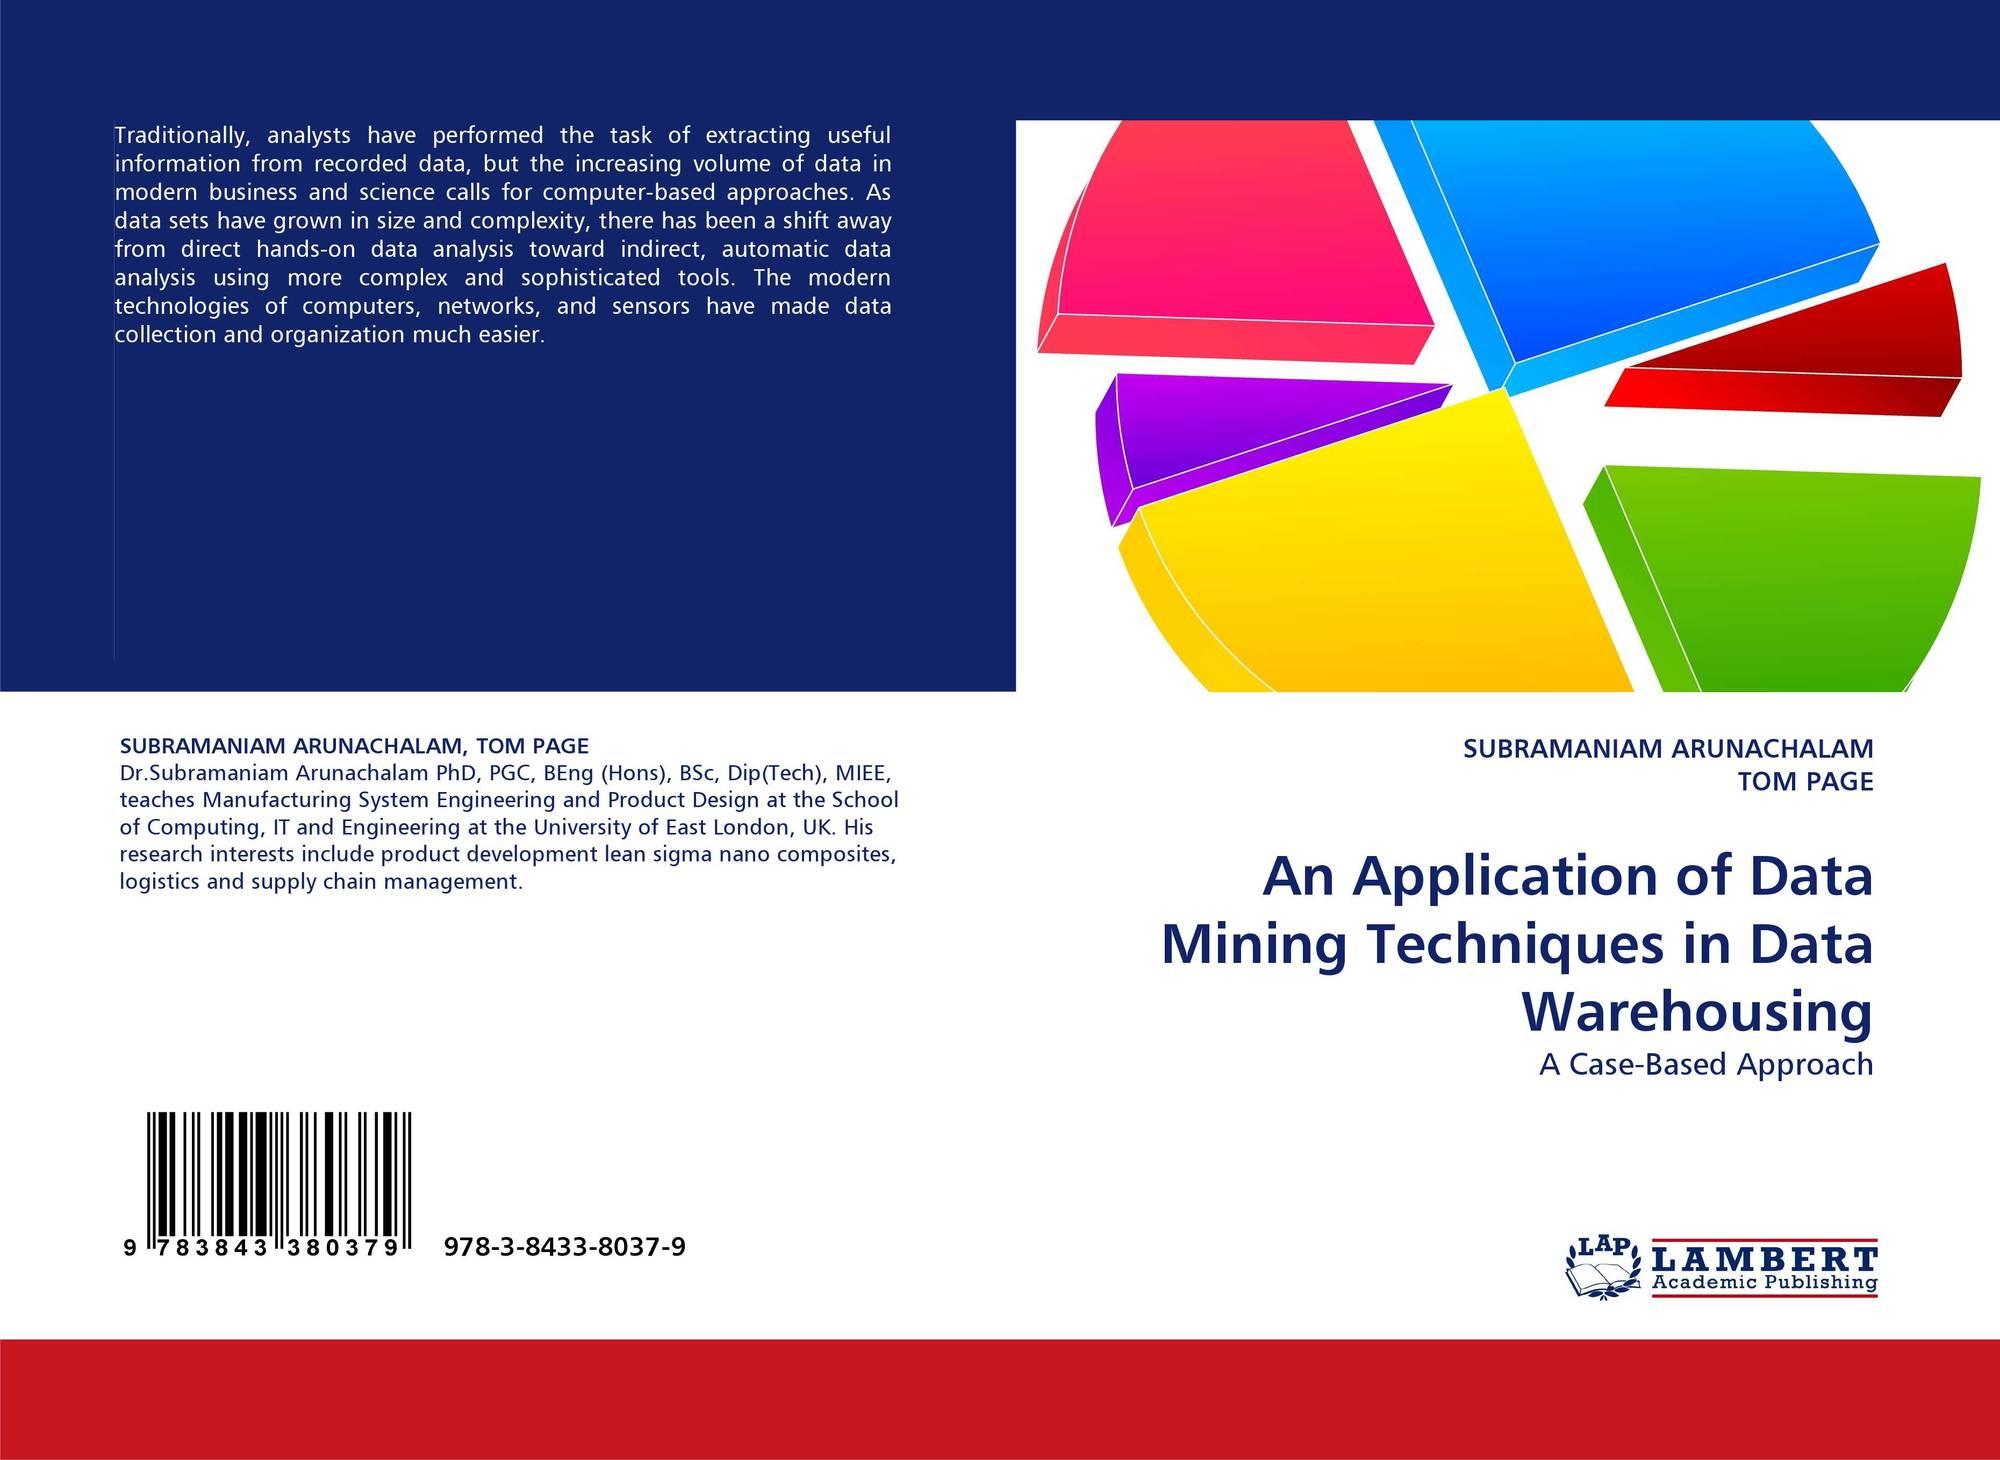 An Application of Data Mining Techniques in Data Warehousing